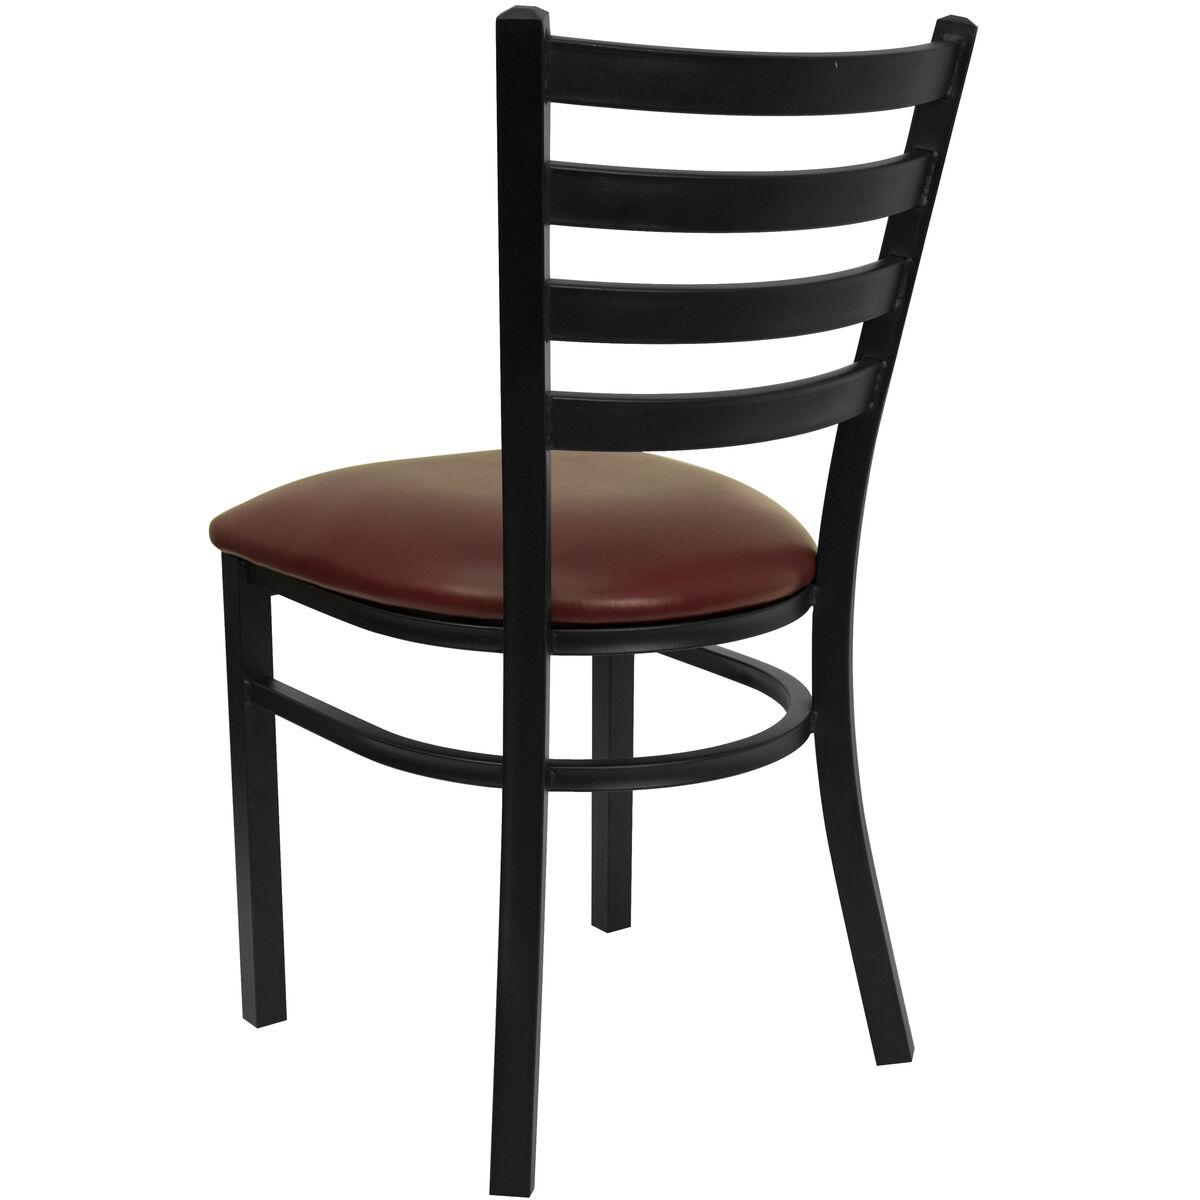 Black ladder chair burg seat bfdh ladby tdr